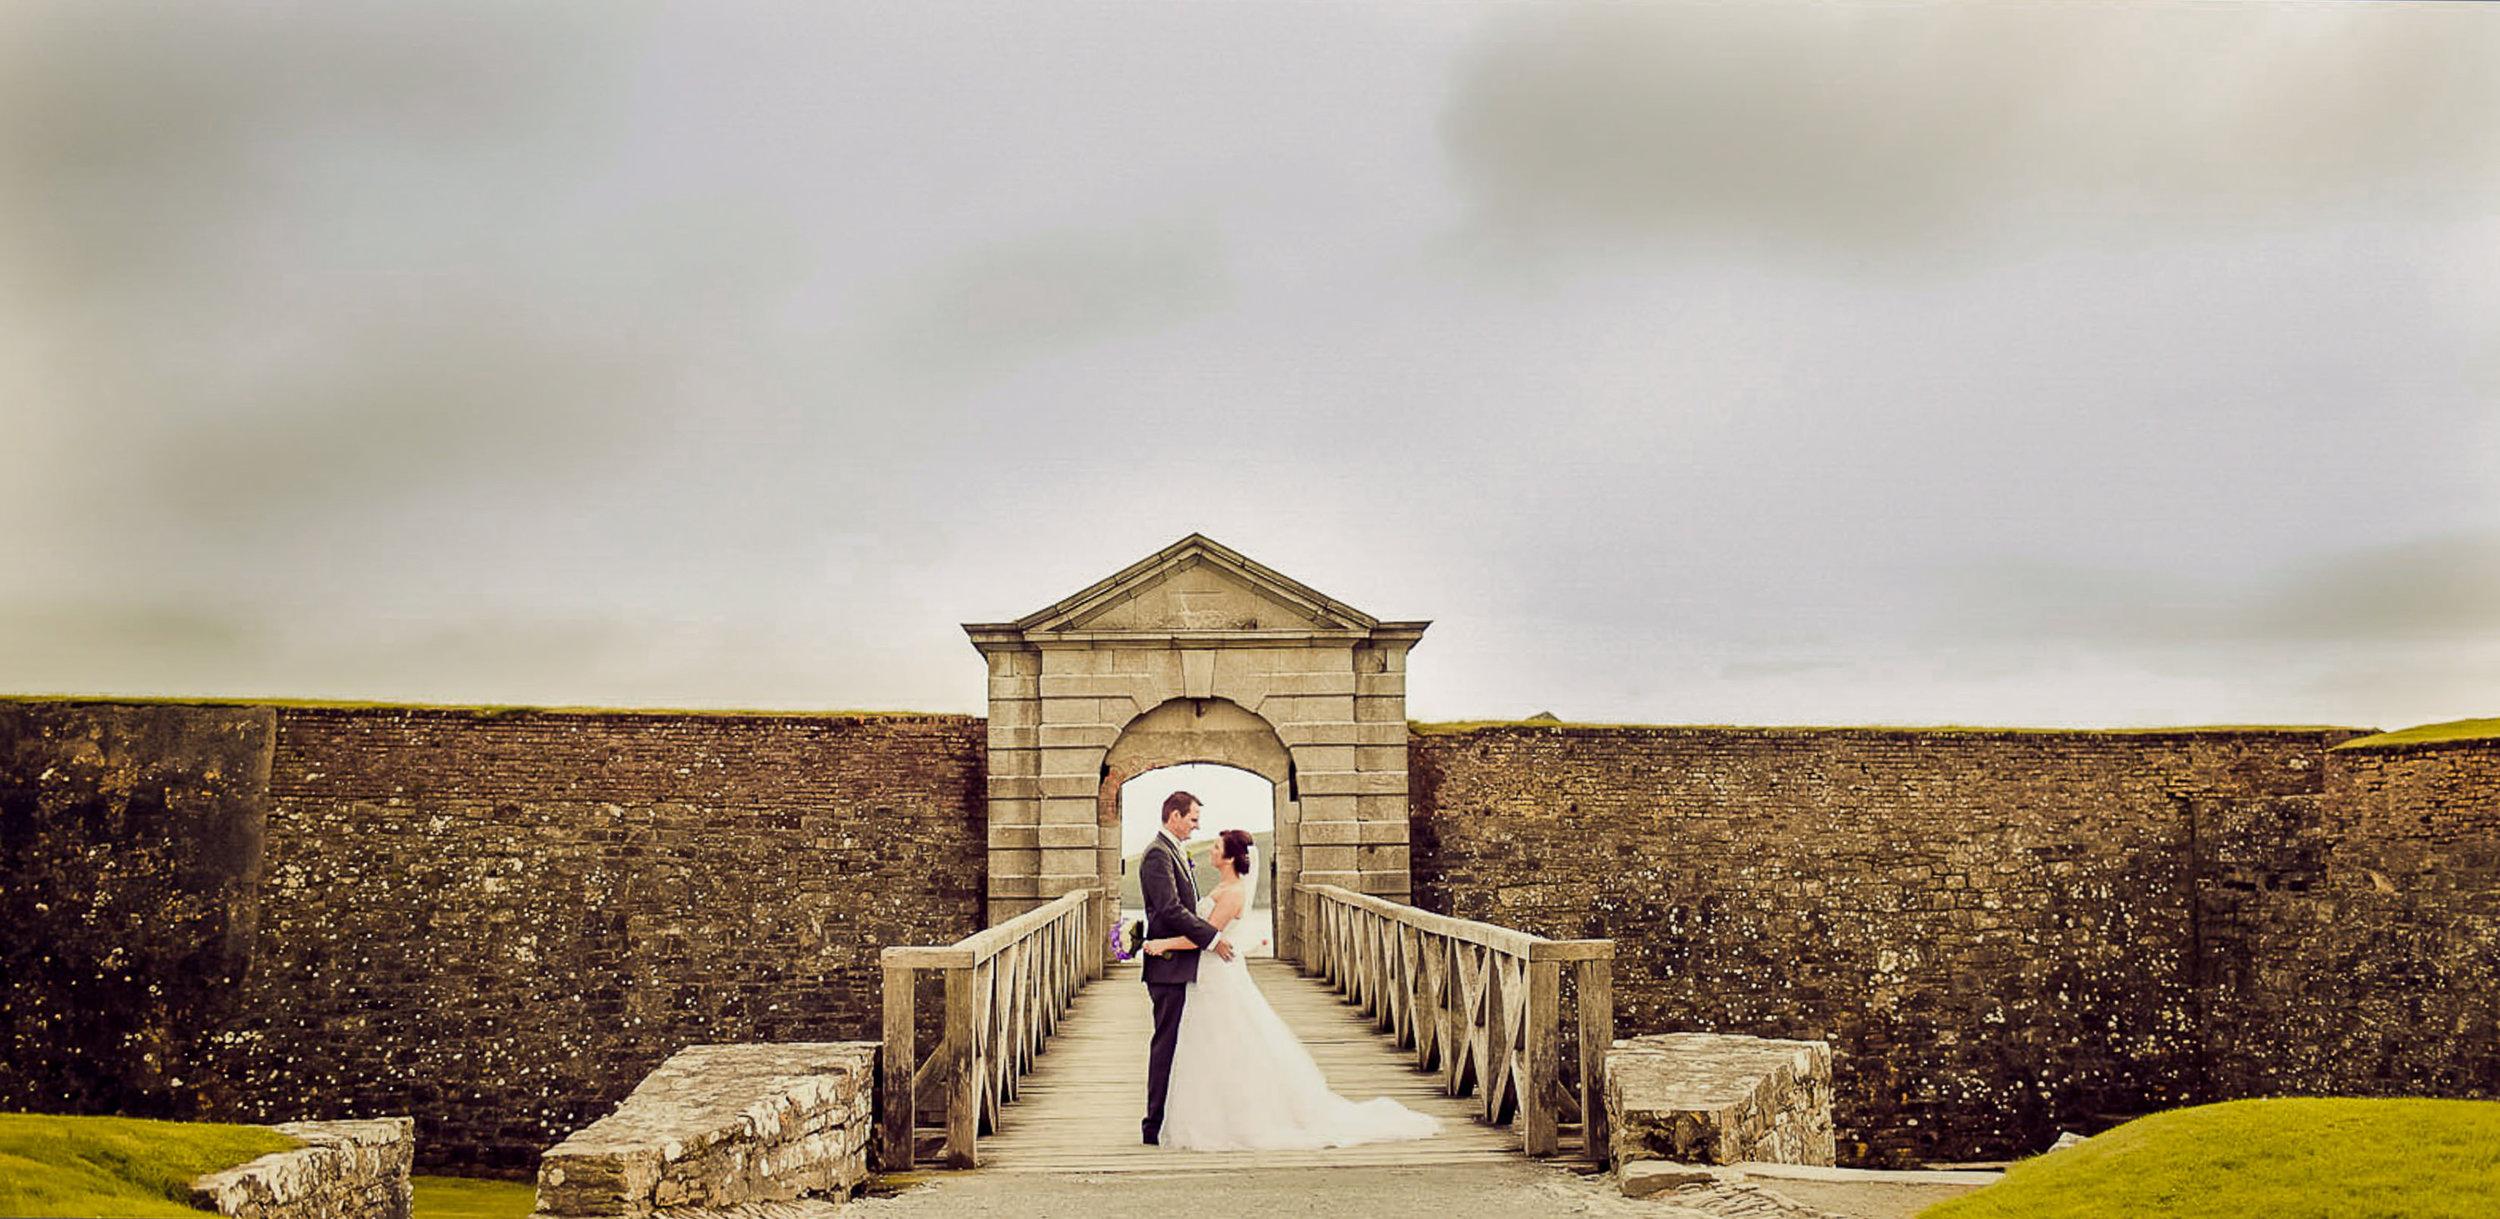 Casey Photography - Cork Kerry Ireland Wedding-1027.jpg